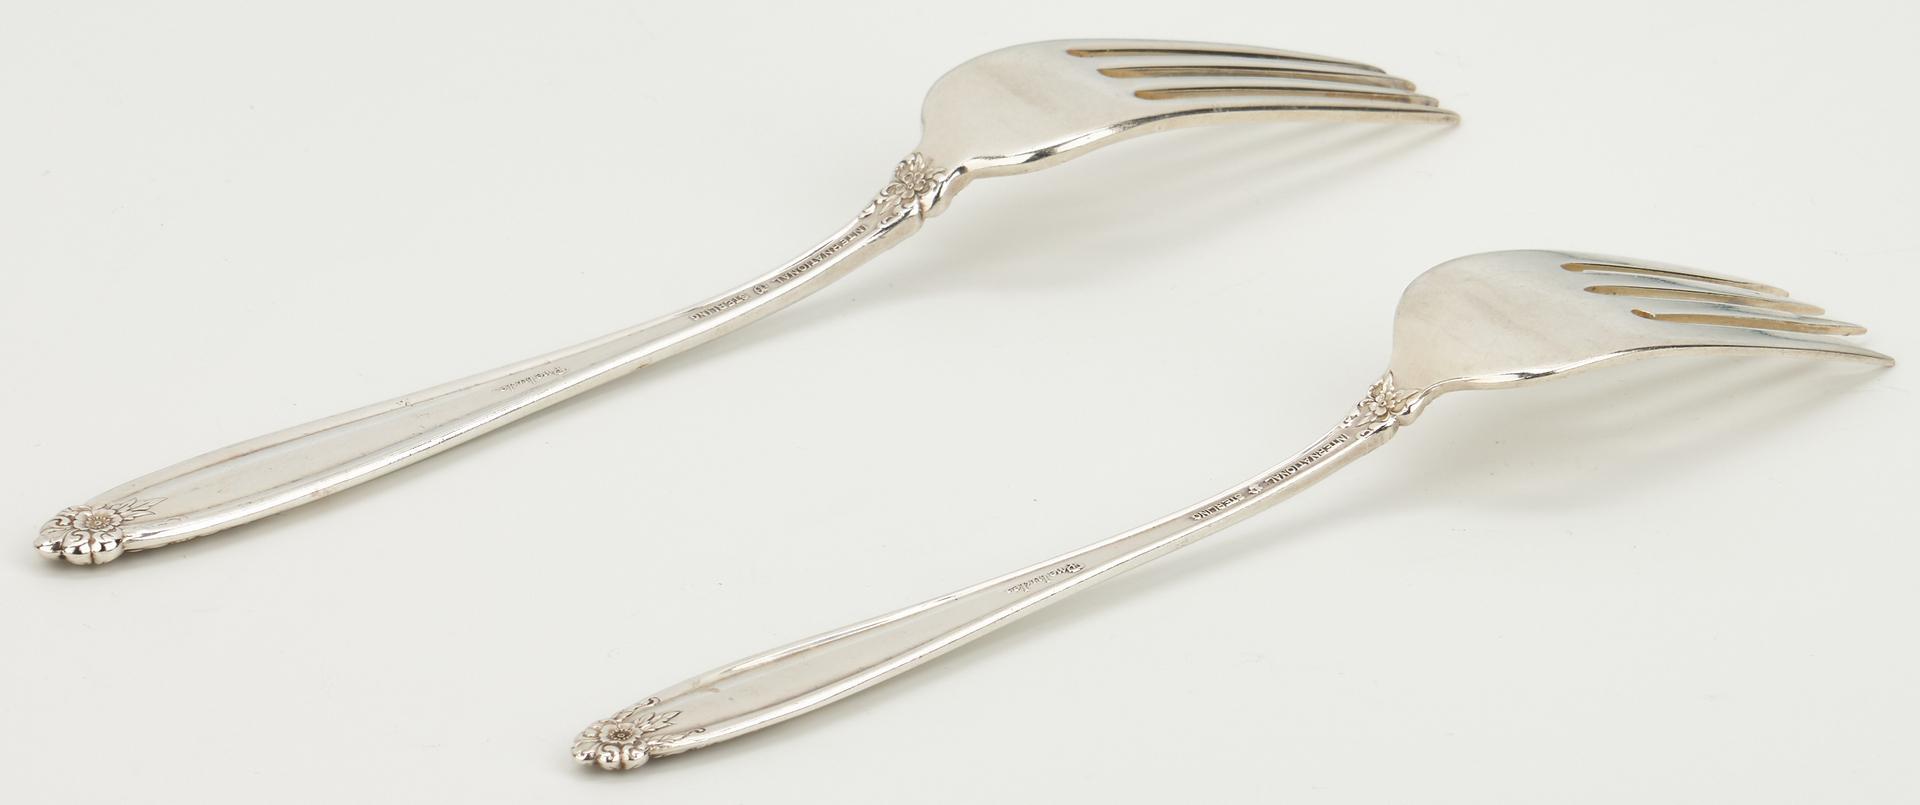 Lot 456: 69 pcs. International Prelude Sterling Silver